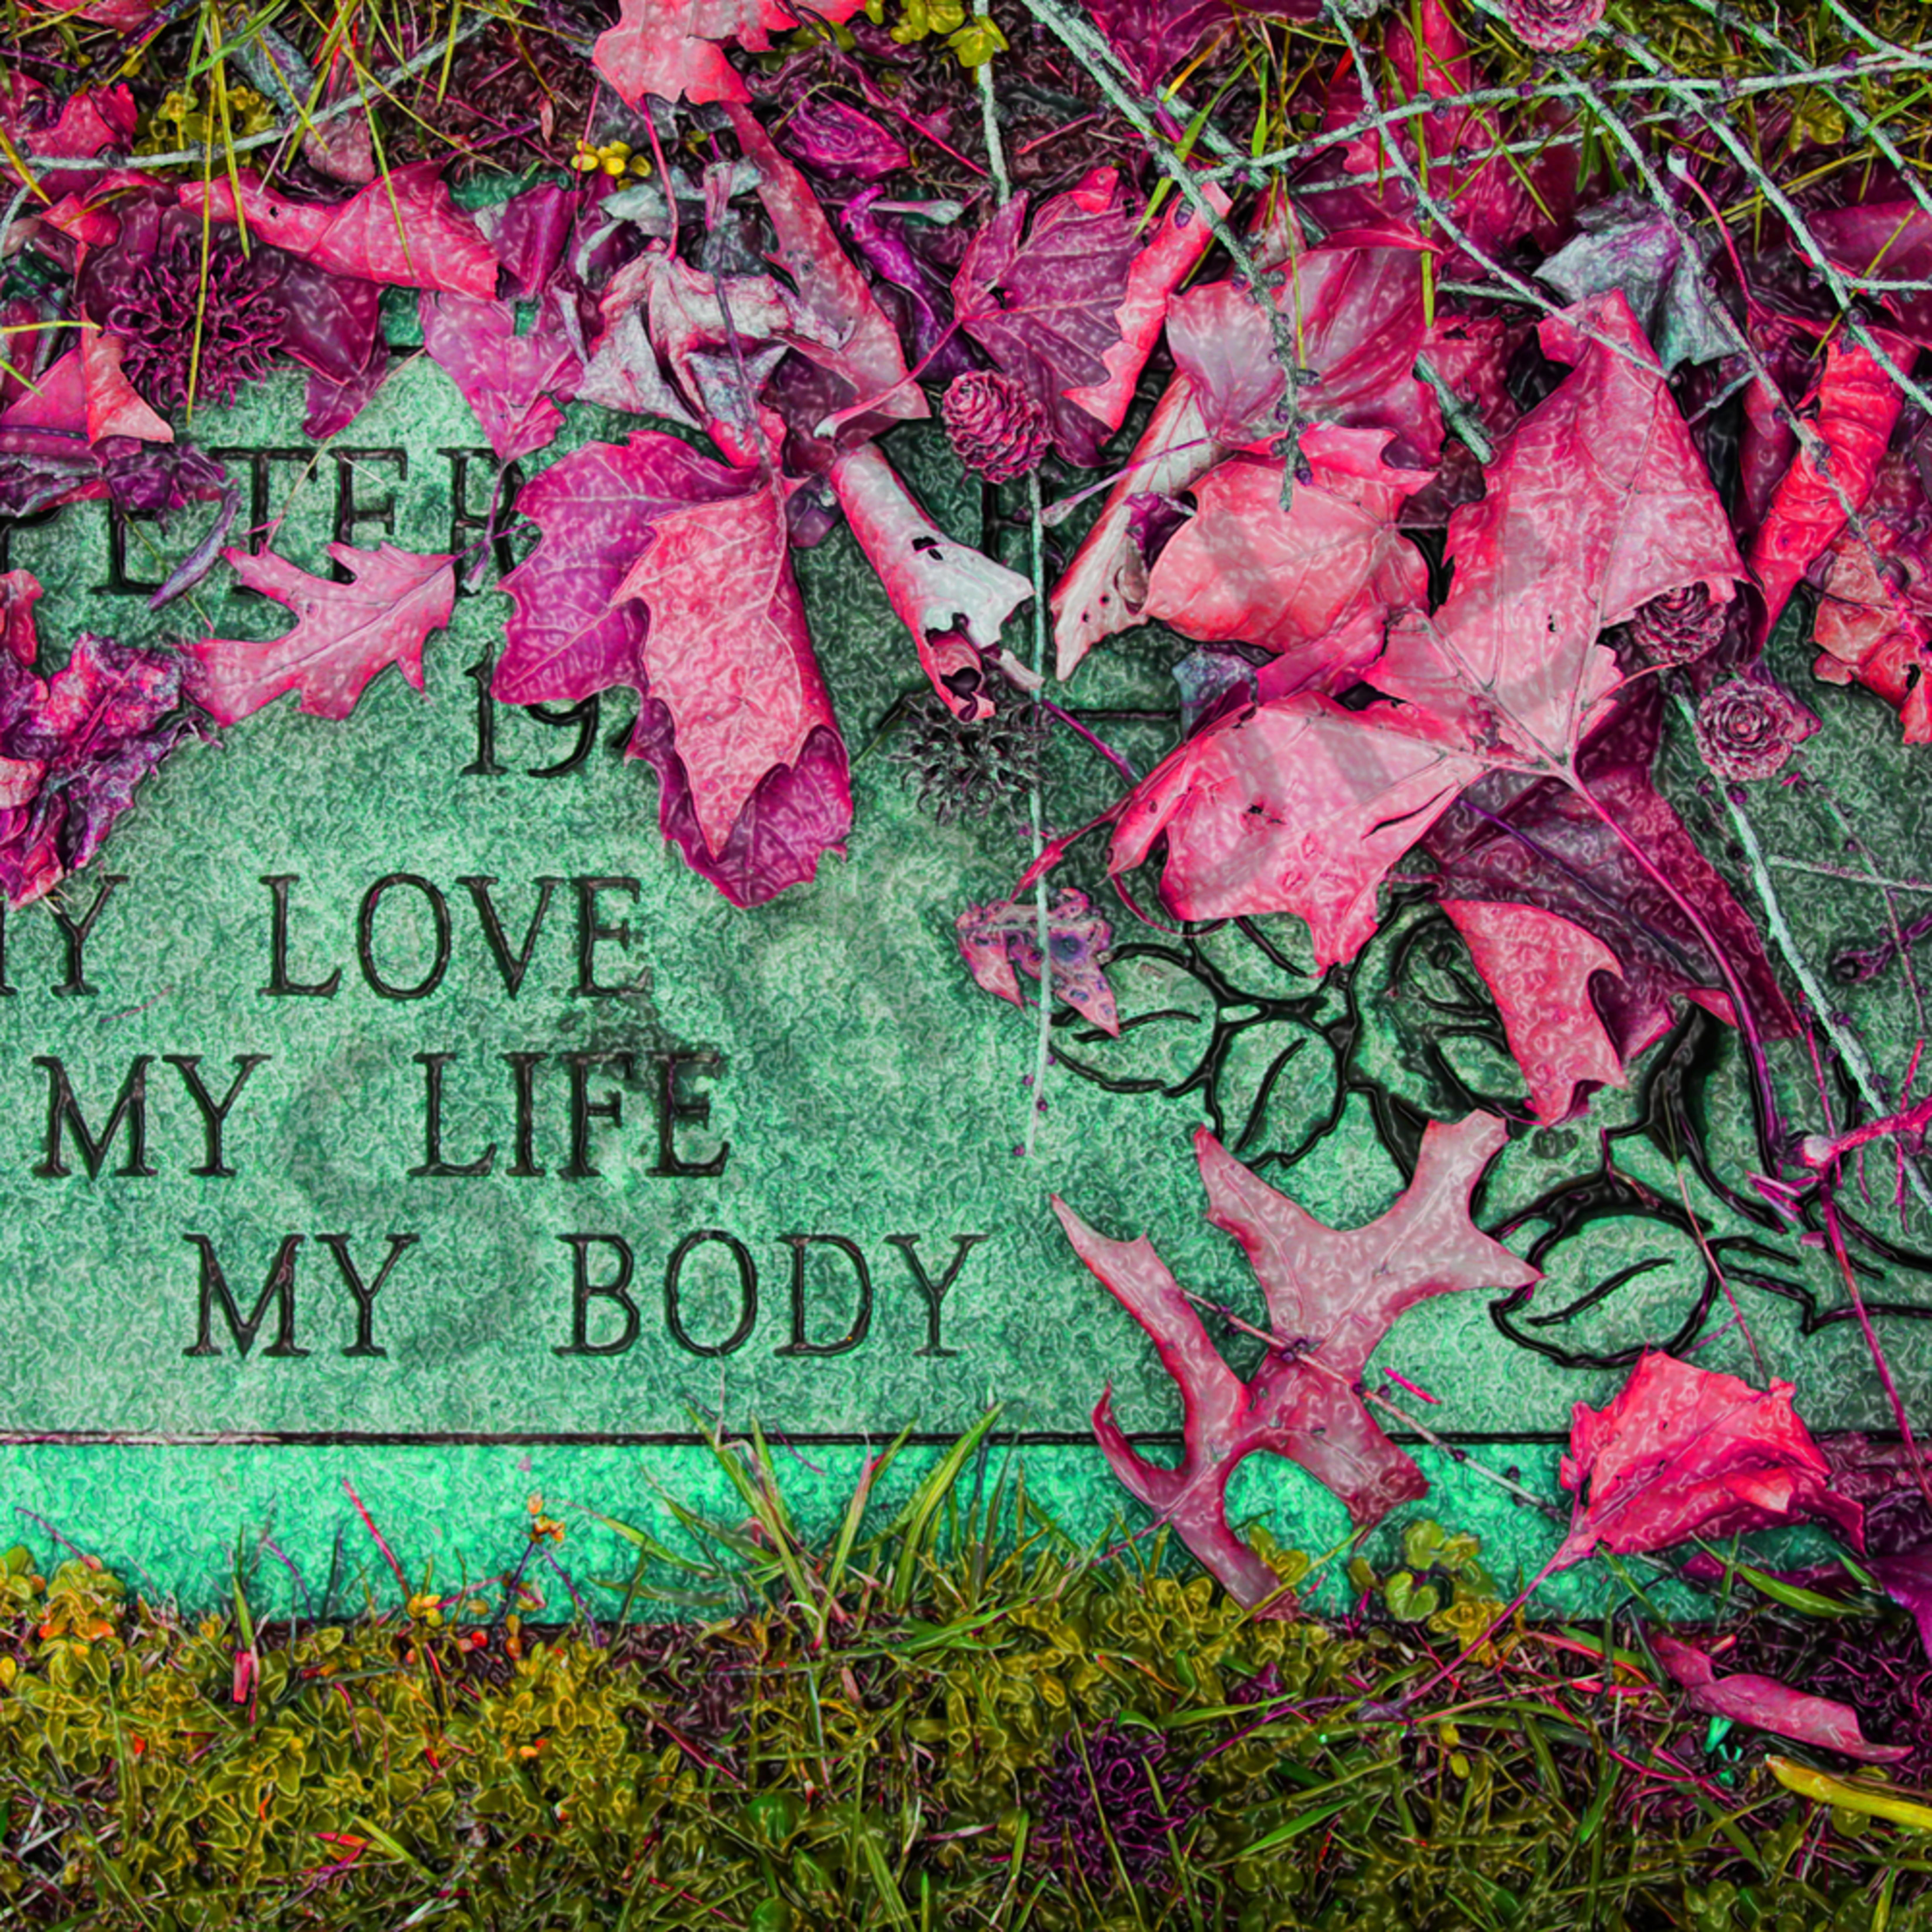 My love my life my body gravestone website uxz1mk